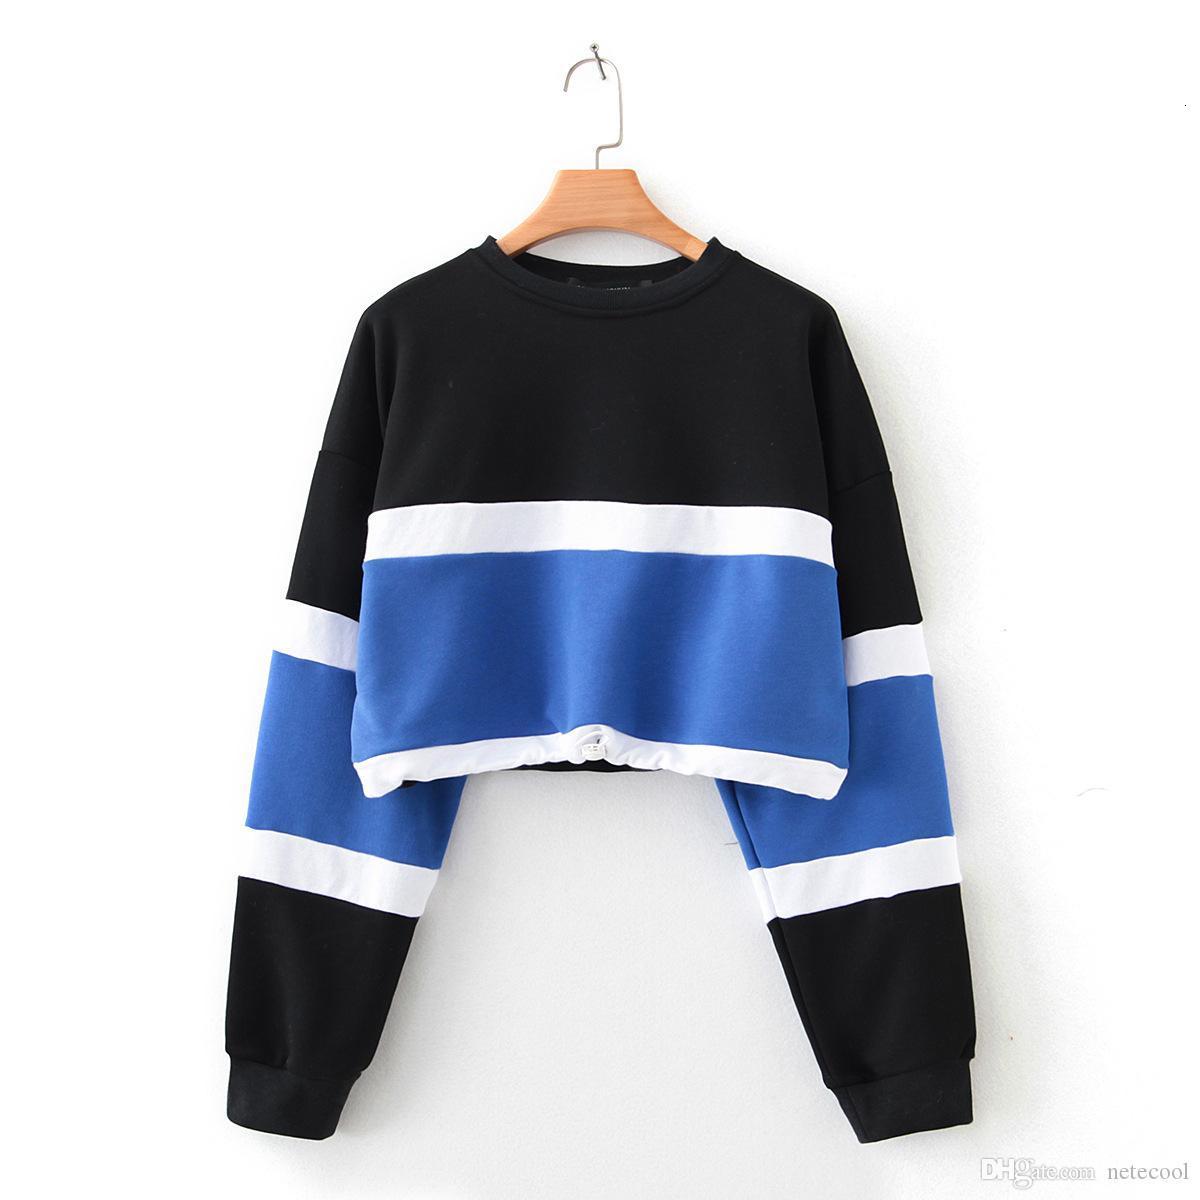 Fashion Cropped Hoodie Womens Long Sleeve Splcing Color Female Sweatshirt Pullover Short Tops Blouse Streetwear Sudadera Mujer